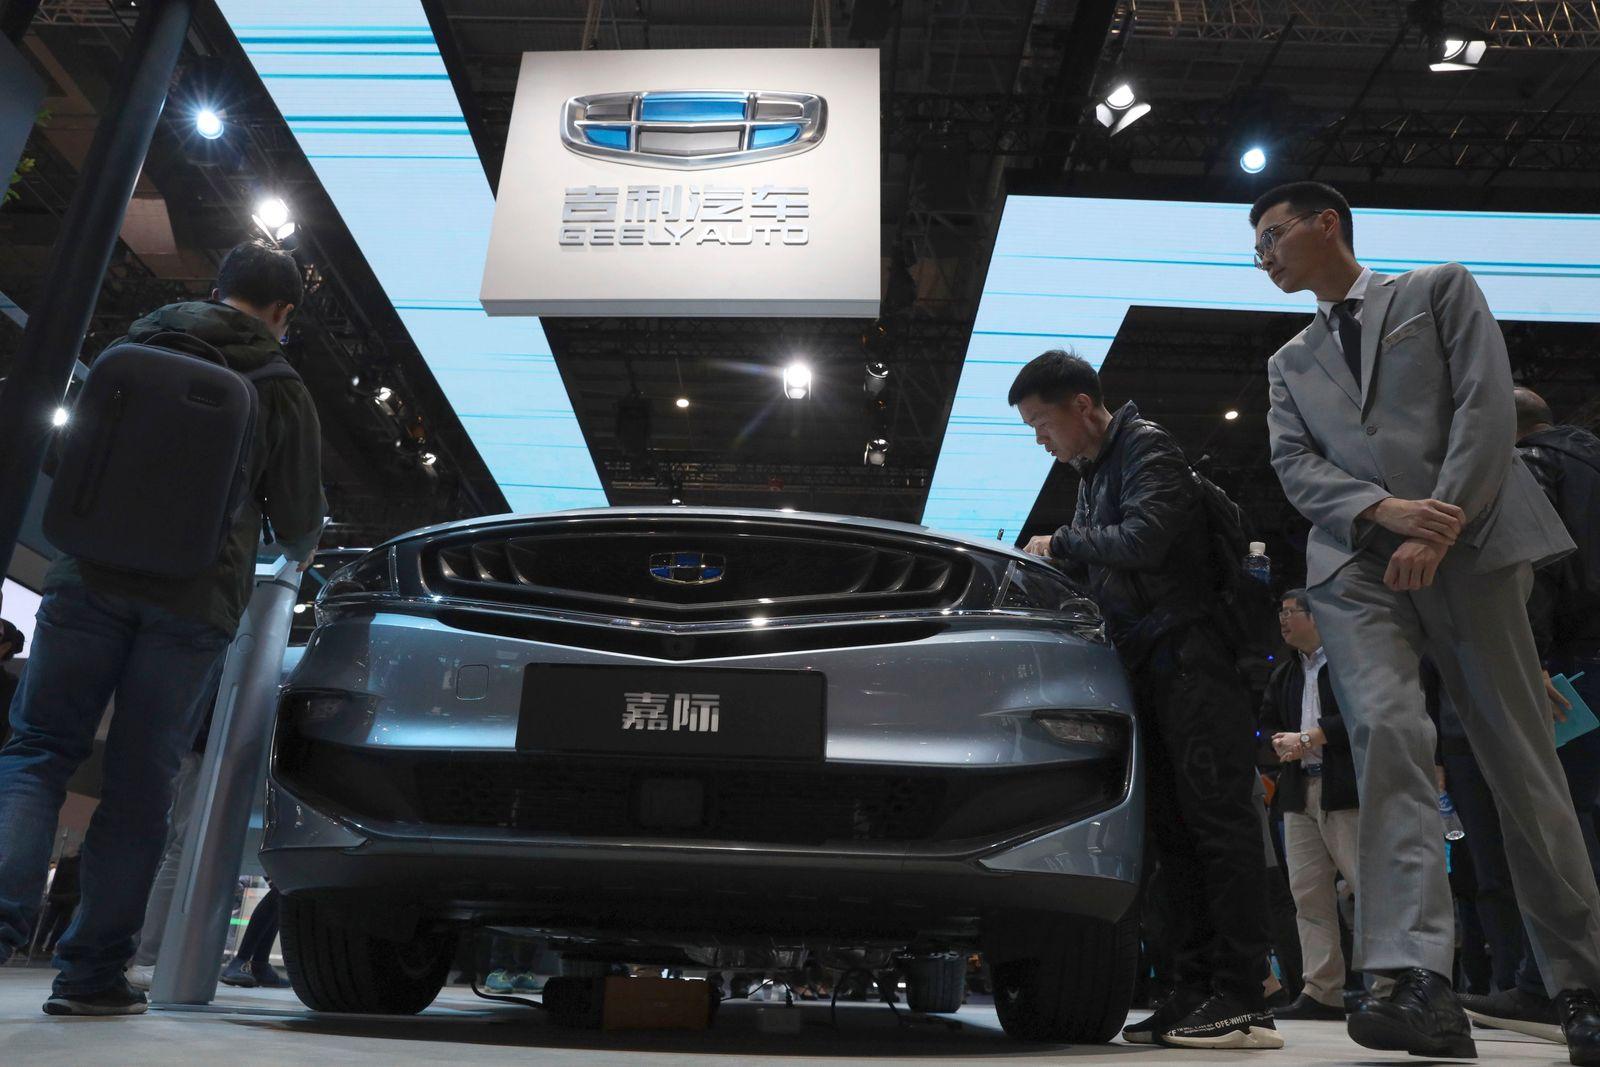 China Electric Car Venture